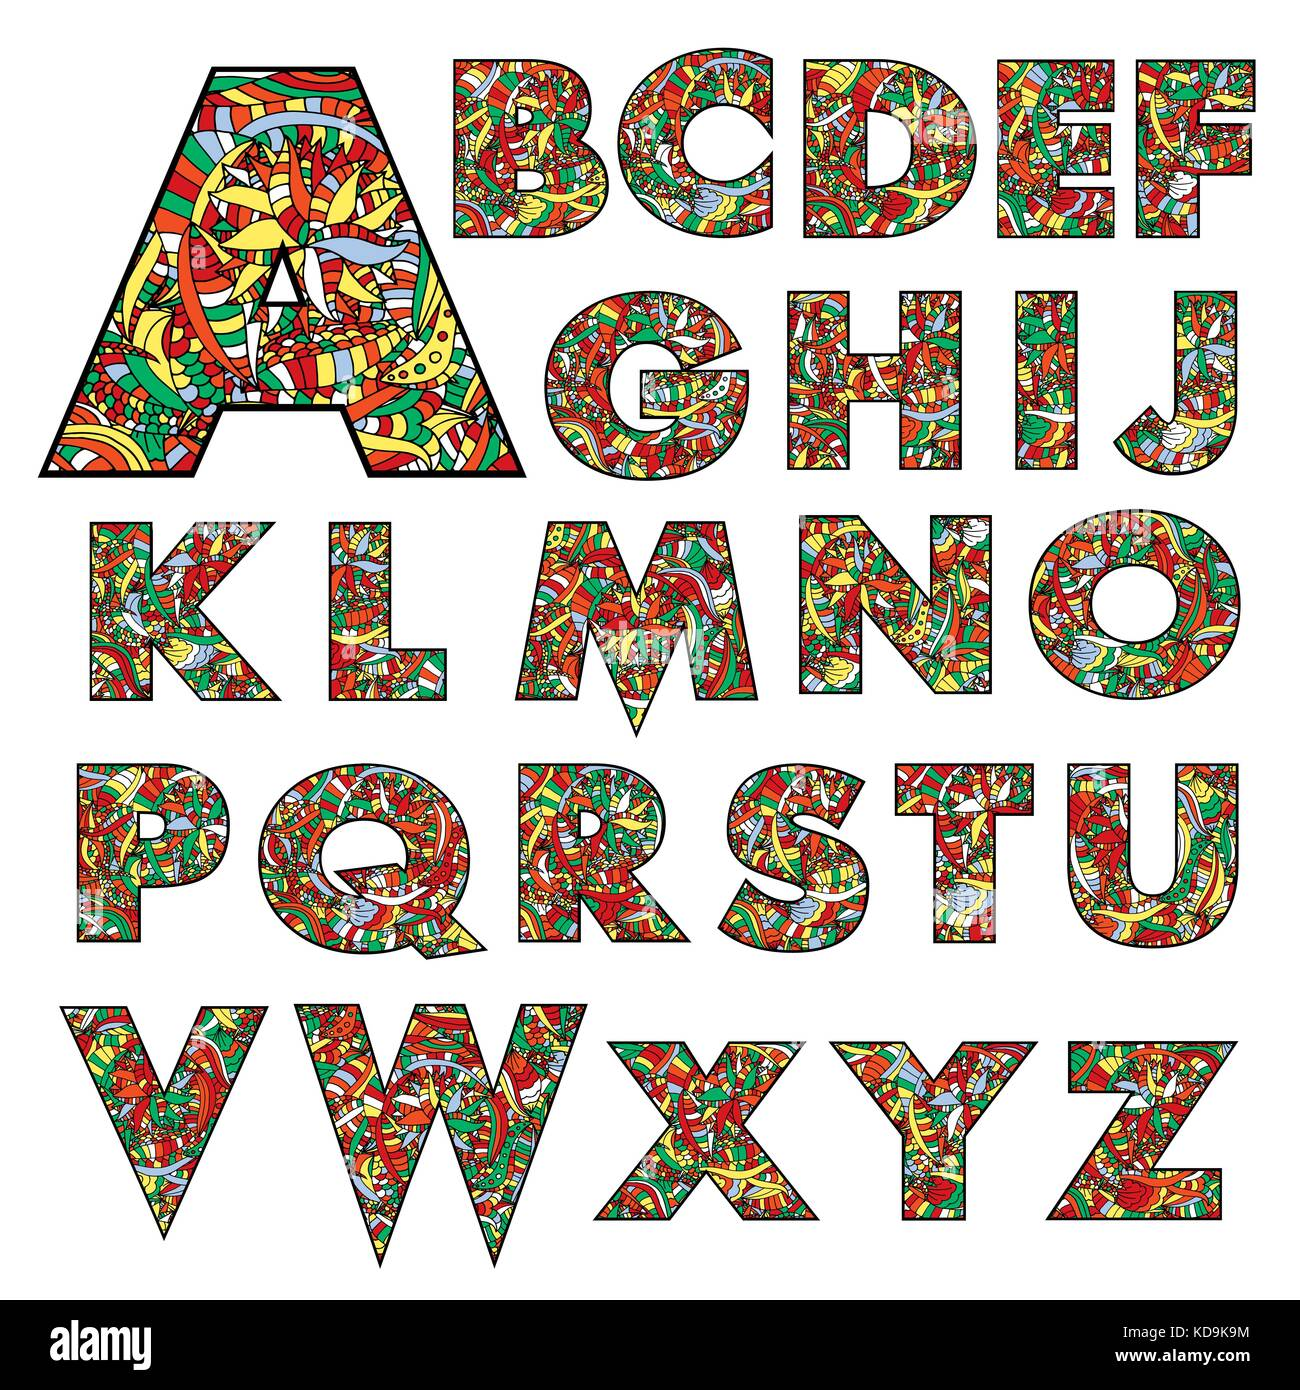 hand drawn floral alphabet design stock photos  u0026 hand drawn floral alphabet design stock images